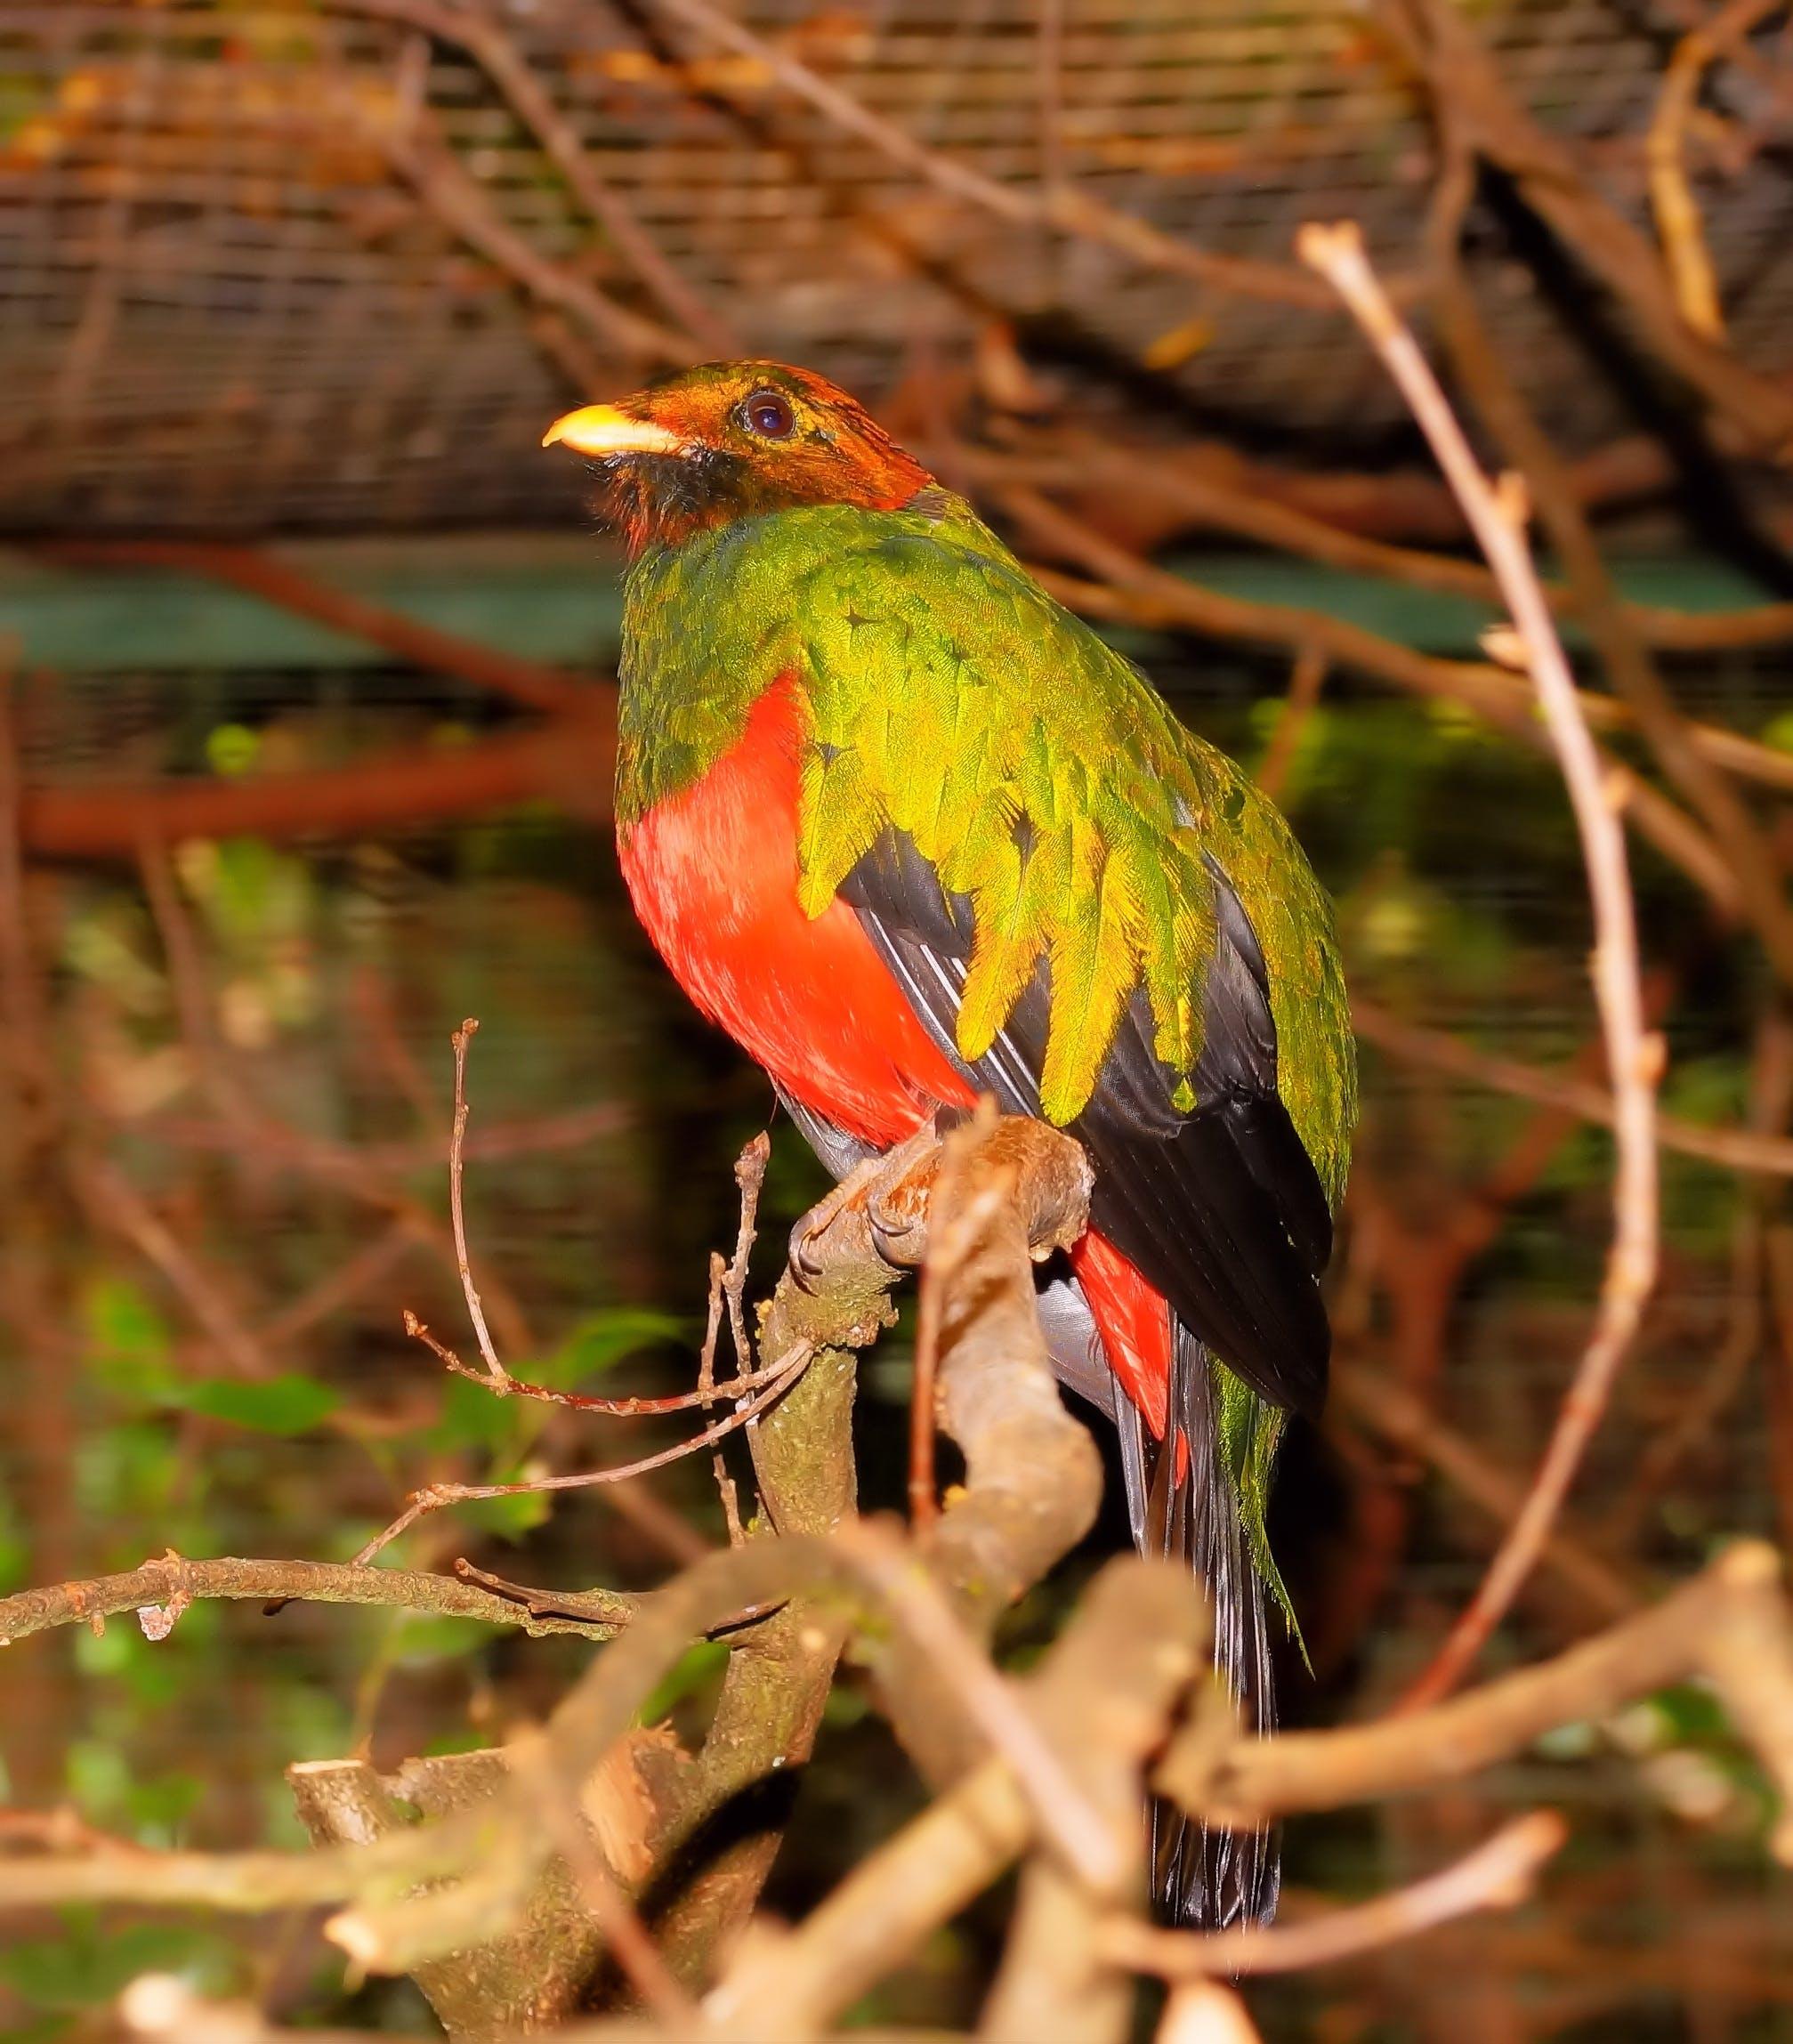 Free stock photo of nature, bird, animal, colorful